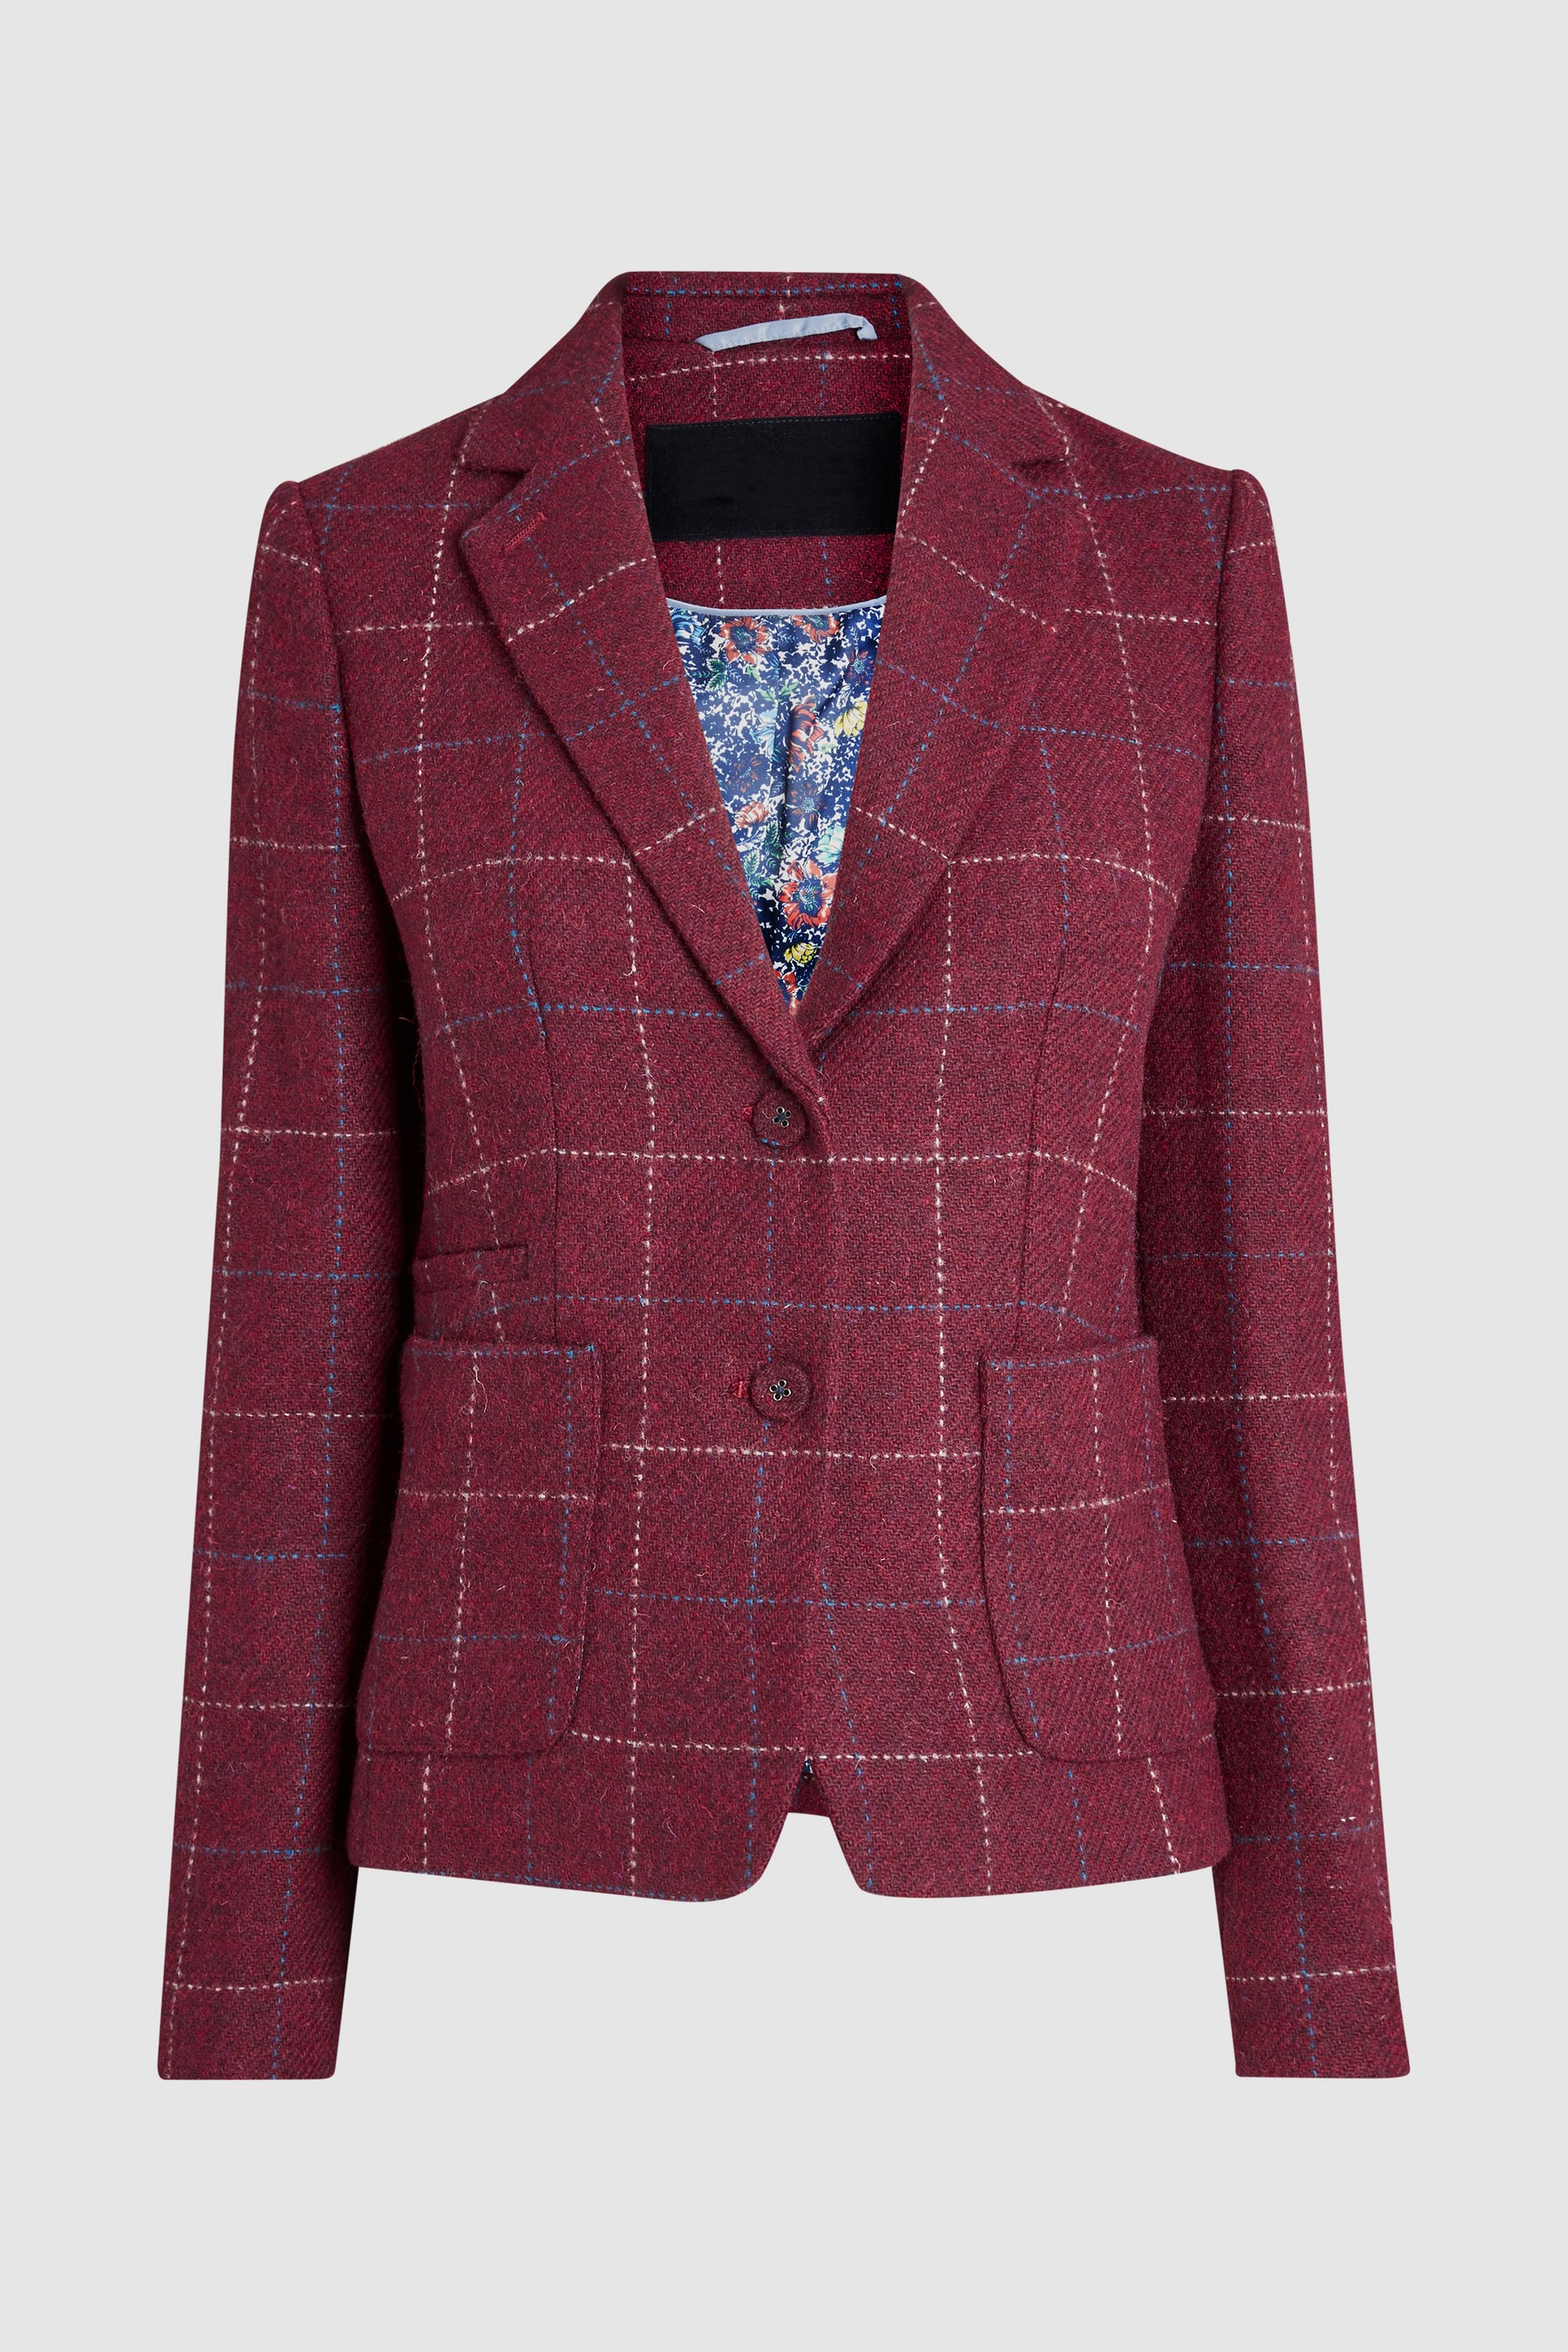 5c973f4eed0 Womens Next Berry Windowpane Harris Tweed Blazer - Red Harris Tweed Jacket,  Padded Jacket,